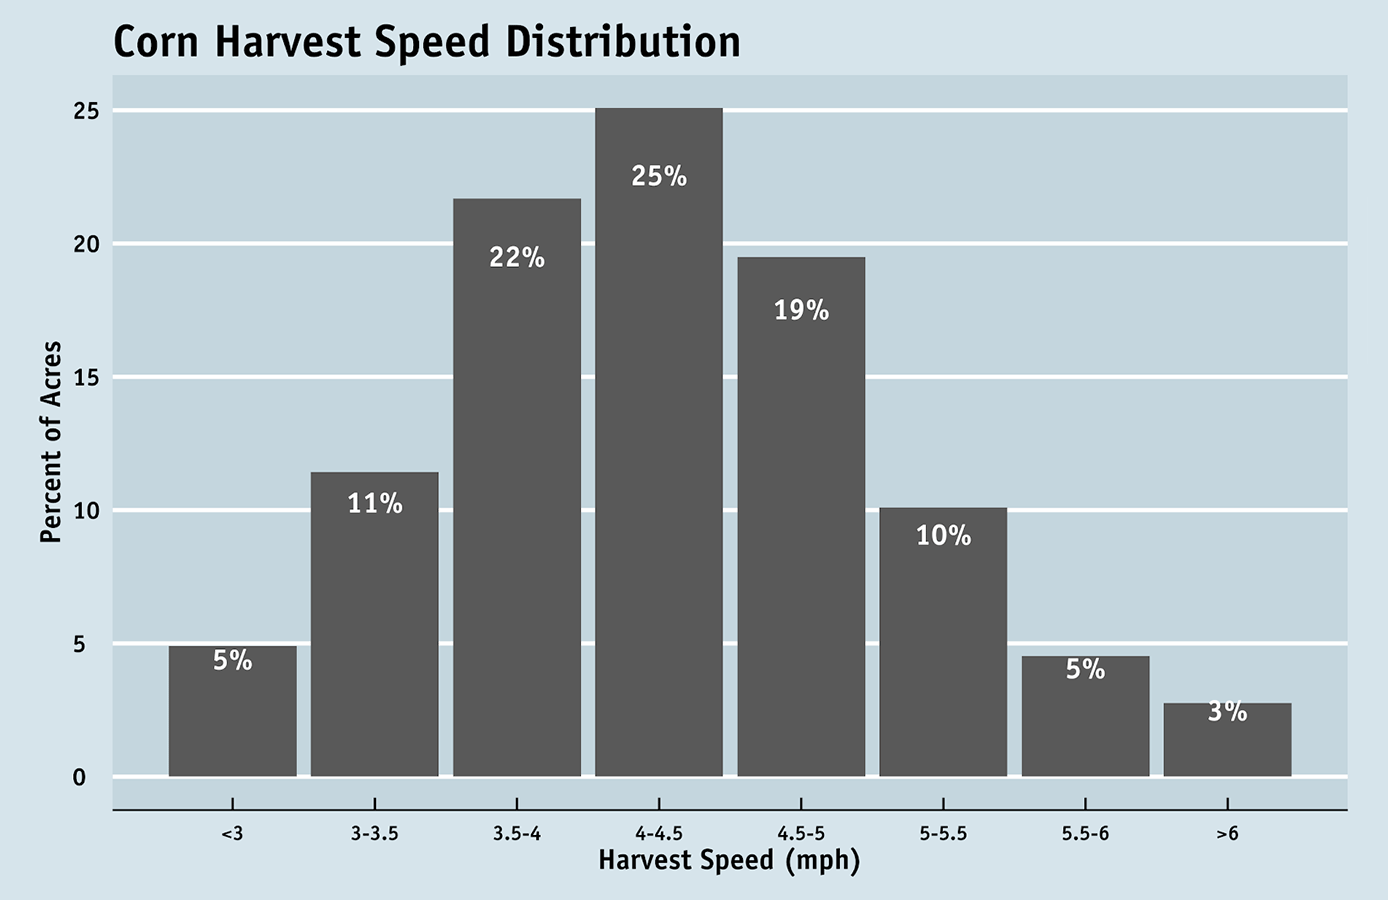 corn harvest speed data